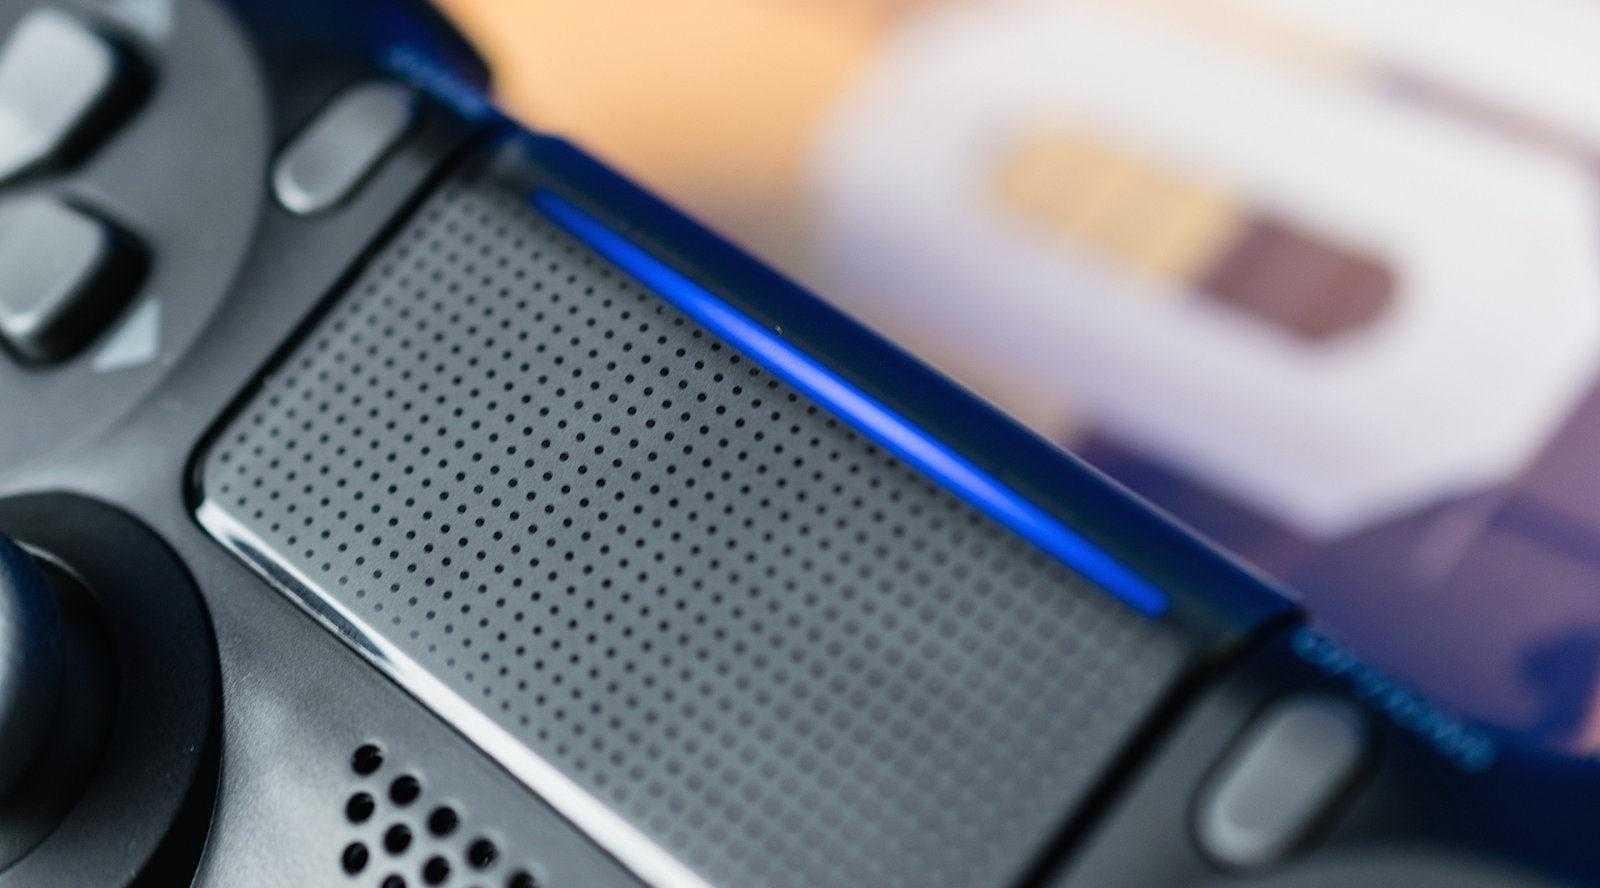 Меньше – не значит хуже. Обзор Sony Playstation 4 Slim (anniversary 23 e1475089265820)